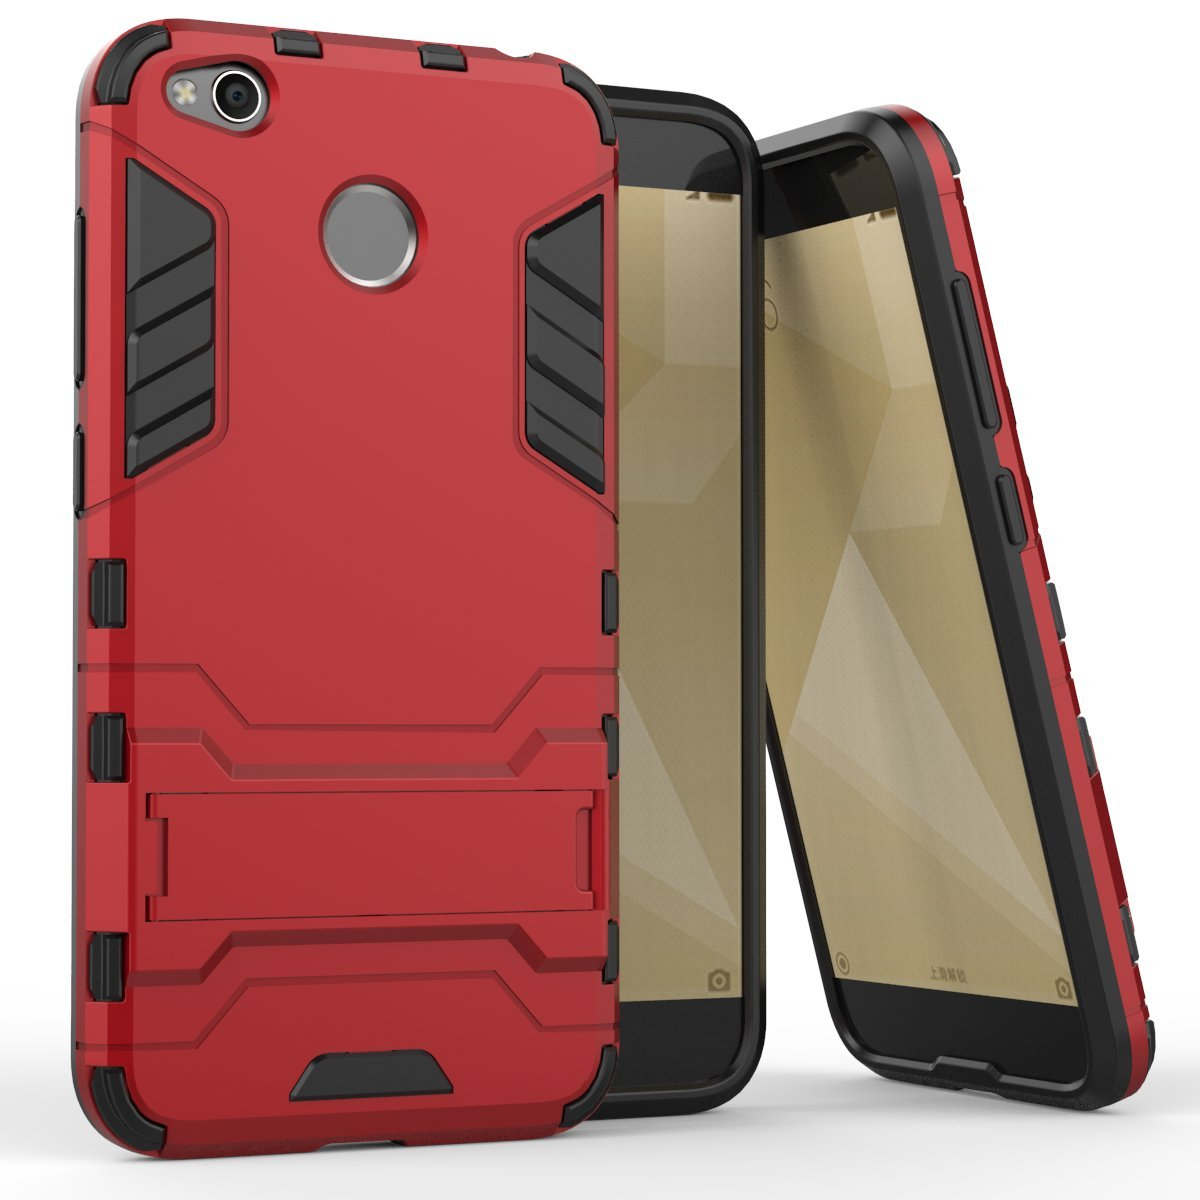 Xiaomi Redmi 4X Funda, adorehouse Hybrid TPU y PC Bumper Back Cover [diseño 2 en 1] Anti-Gota Anti-Choques Rígido Carcasas para Xiaomi Redmi 4X (Rouge)